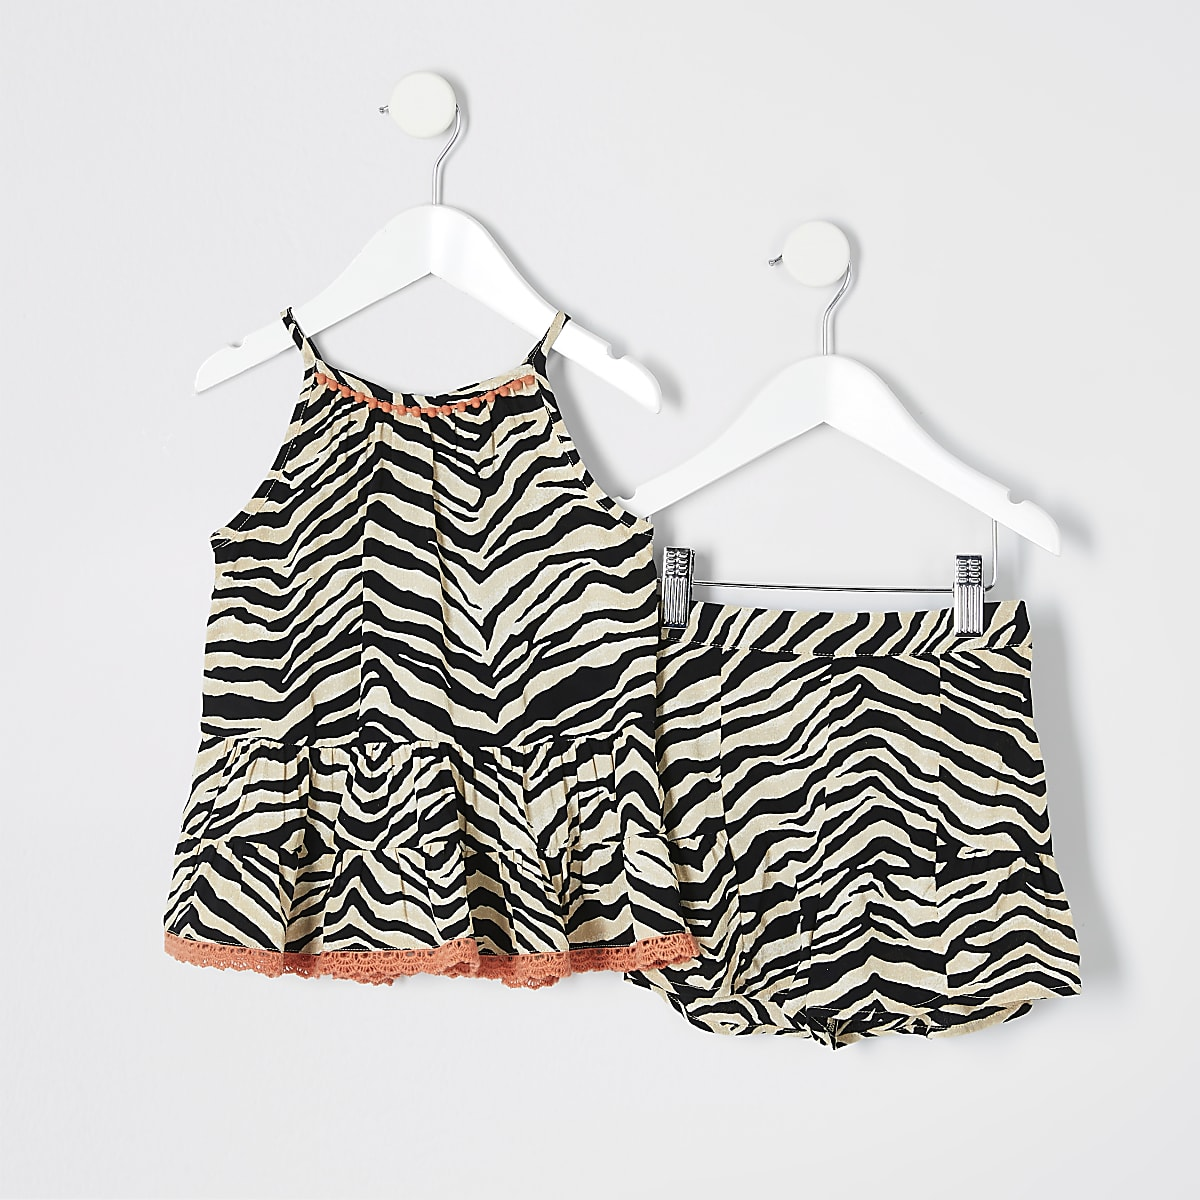 ad5f29ceb3d99 Mini girls brown zebra print cami top outfit